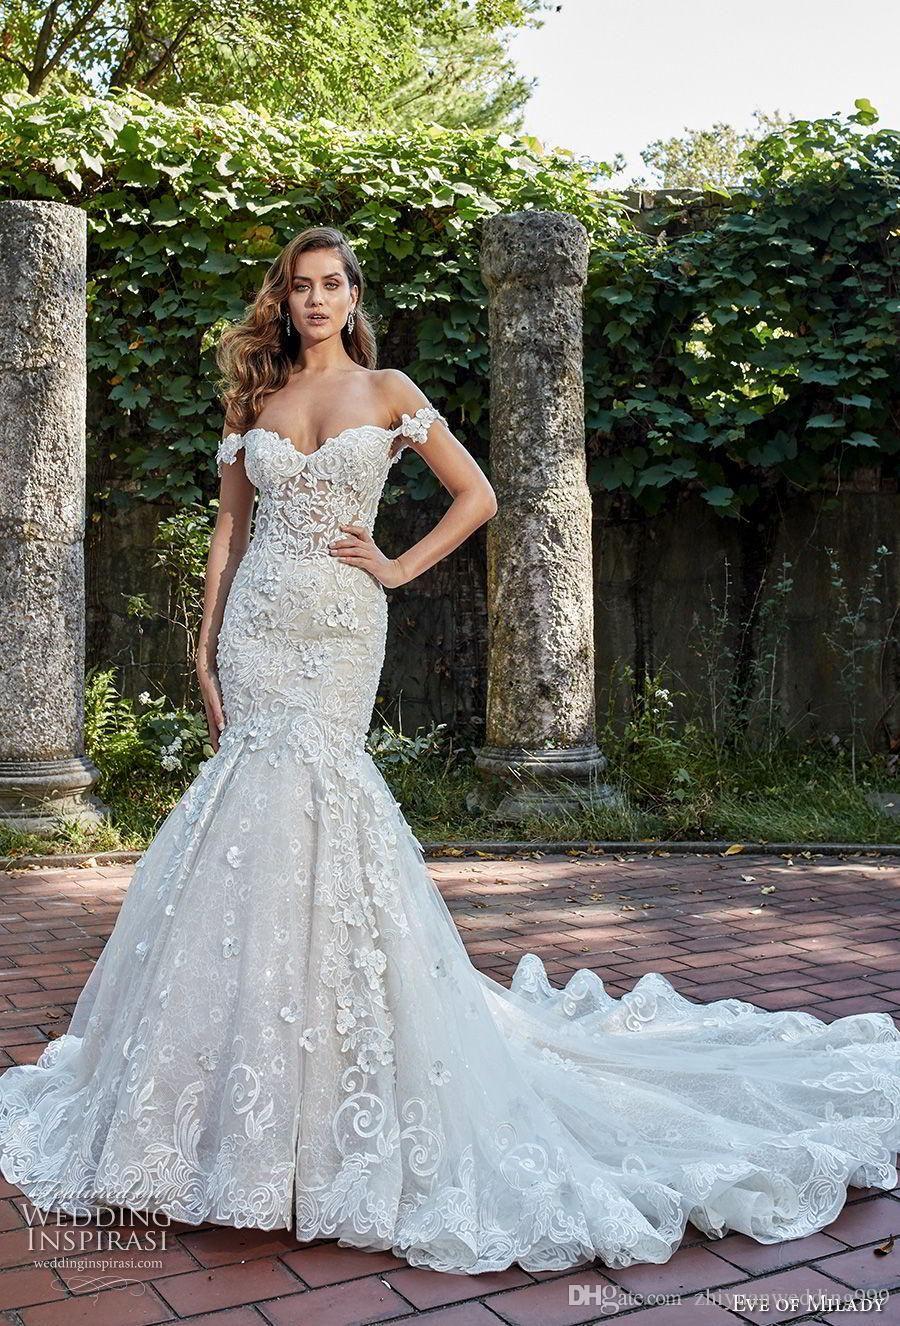 fe93e7745a6 Glamorous Wedding Dresses elegant glamorous mermaid wedding dresses 2018 eve  of milady off the shoulder sweetheart neckline full embellishment open back  ...